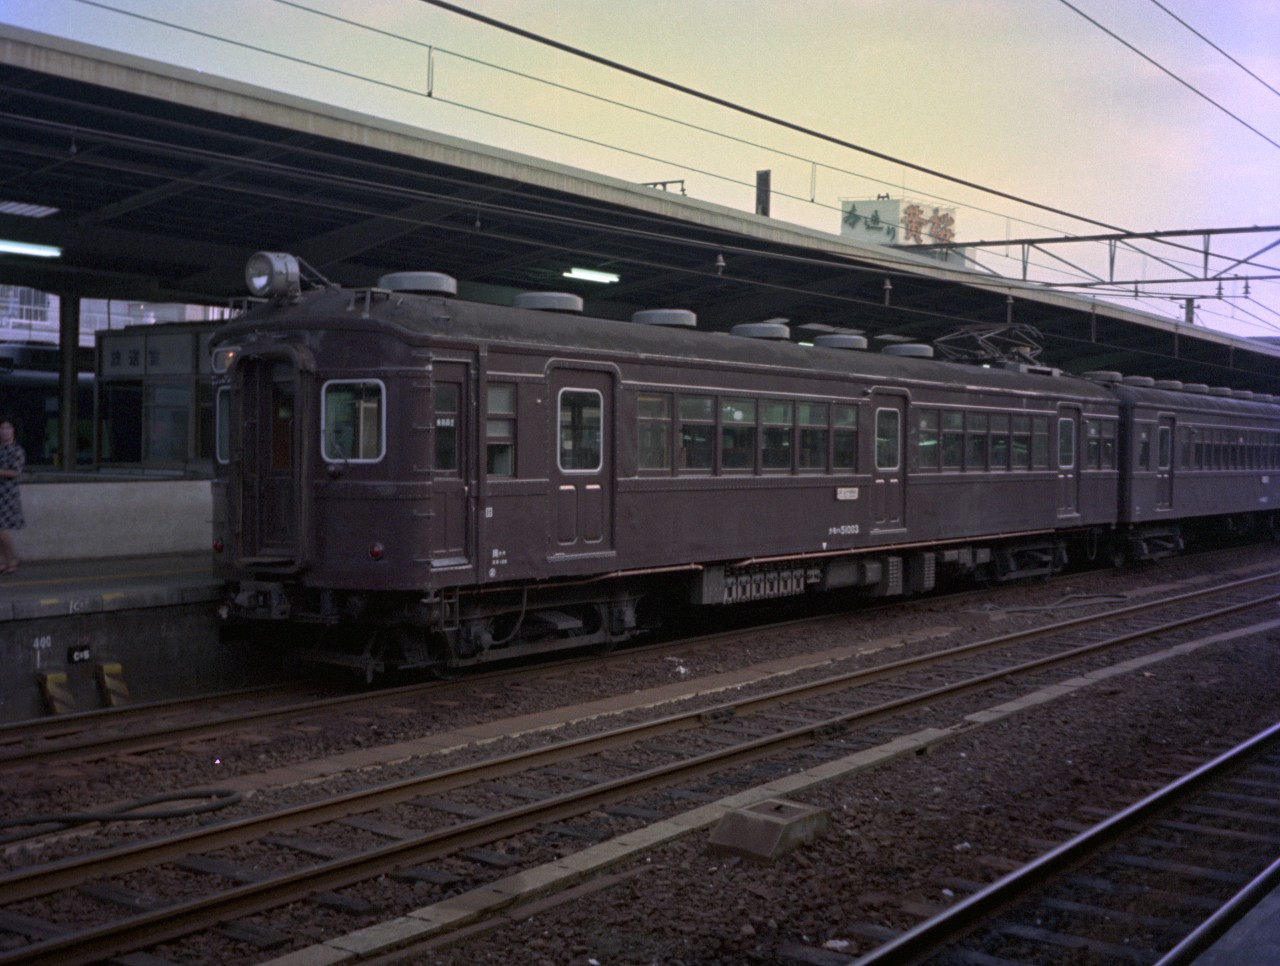 f:id:yasuo_ssi:20200822221154j:plain